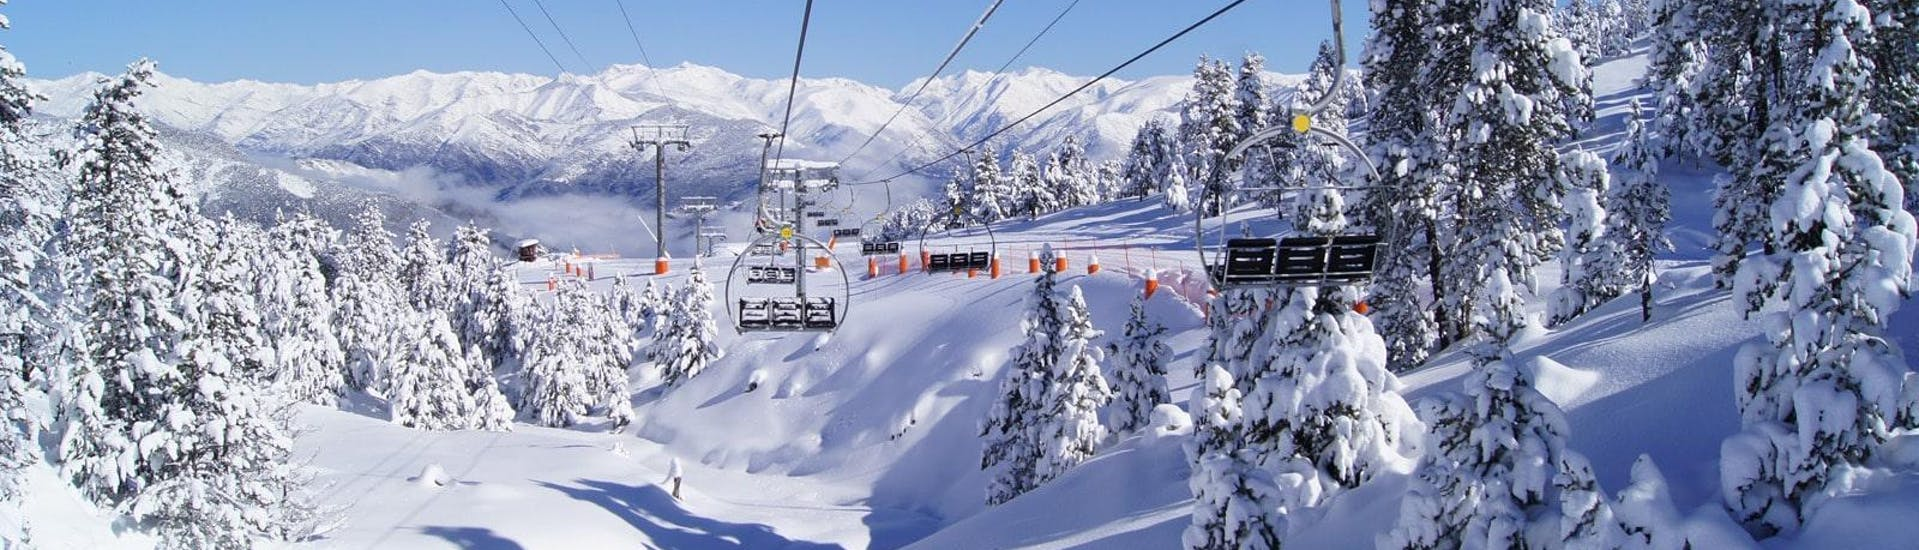 Snowboard Instructor Private - All Levels & Ages avec Escola d'Esquí Pallars Sobira - Hero image